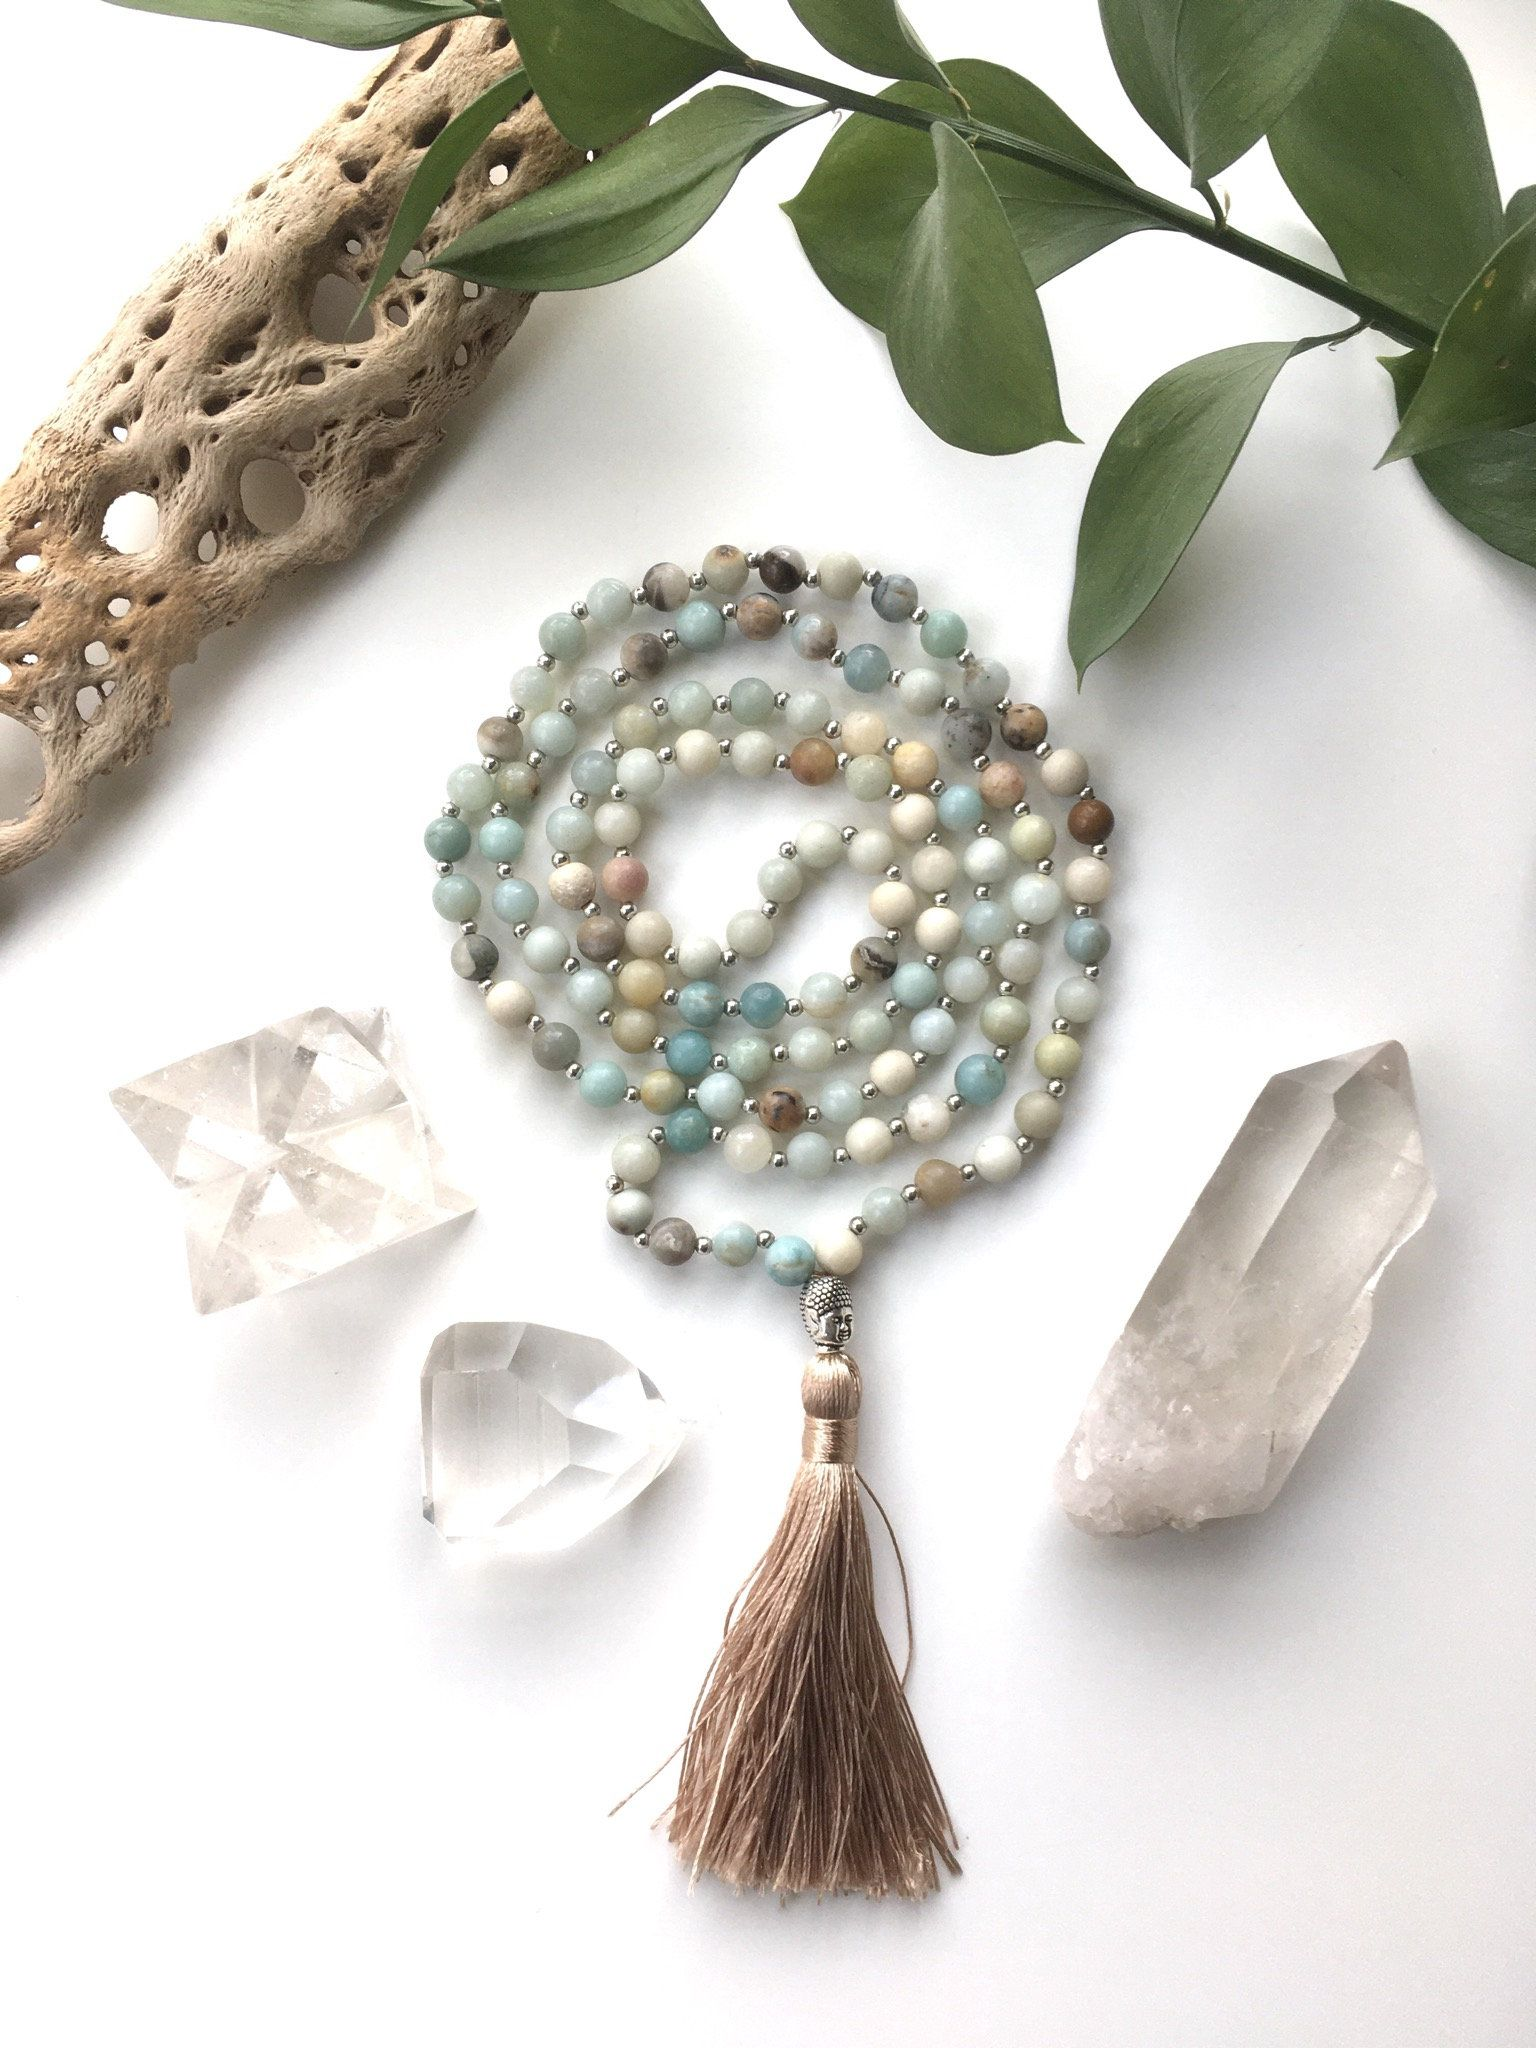 Mala Necklace Mala Beads Necklace 108 Mala Bead Mala Beads